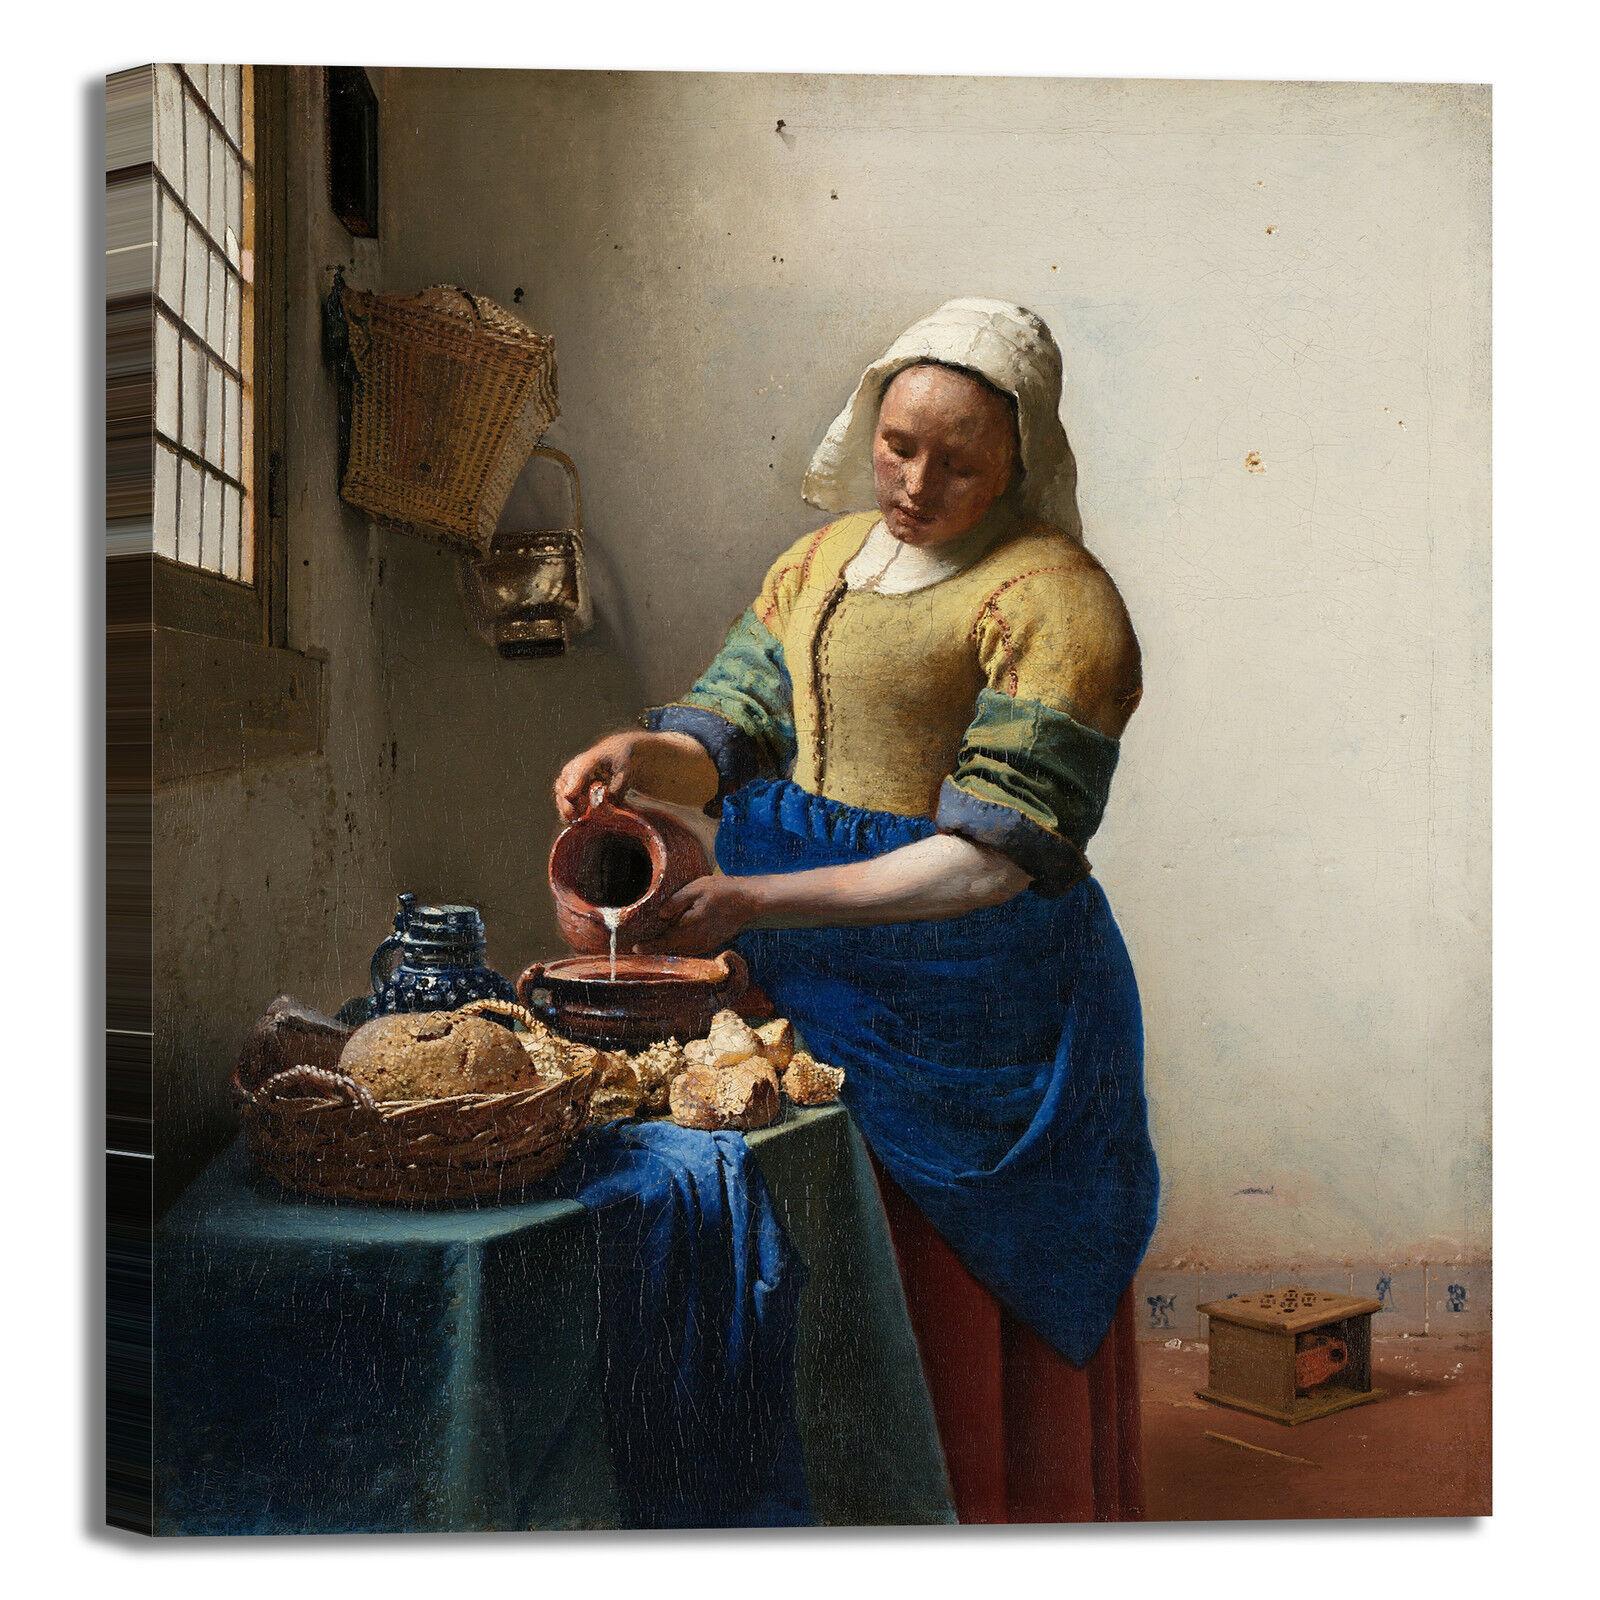 Vermeer la lattaia design quadro stampa tela dipinto telaio arroto casa